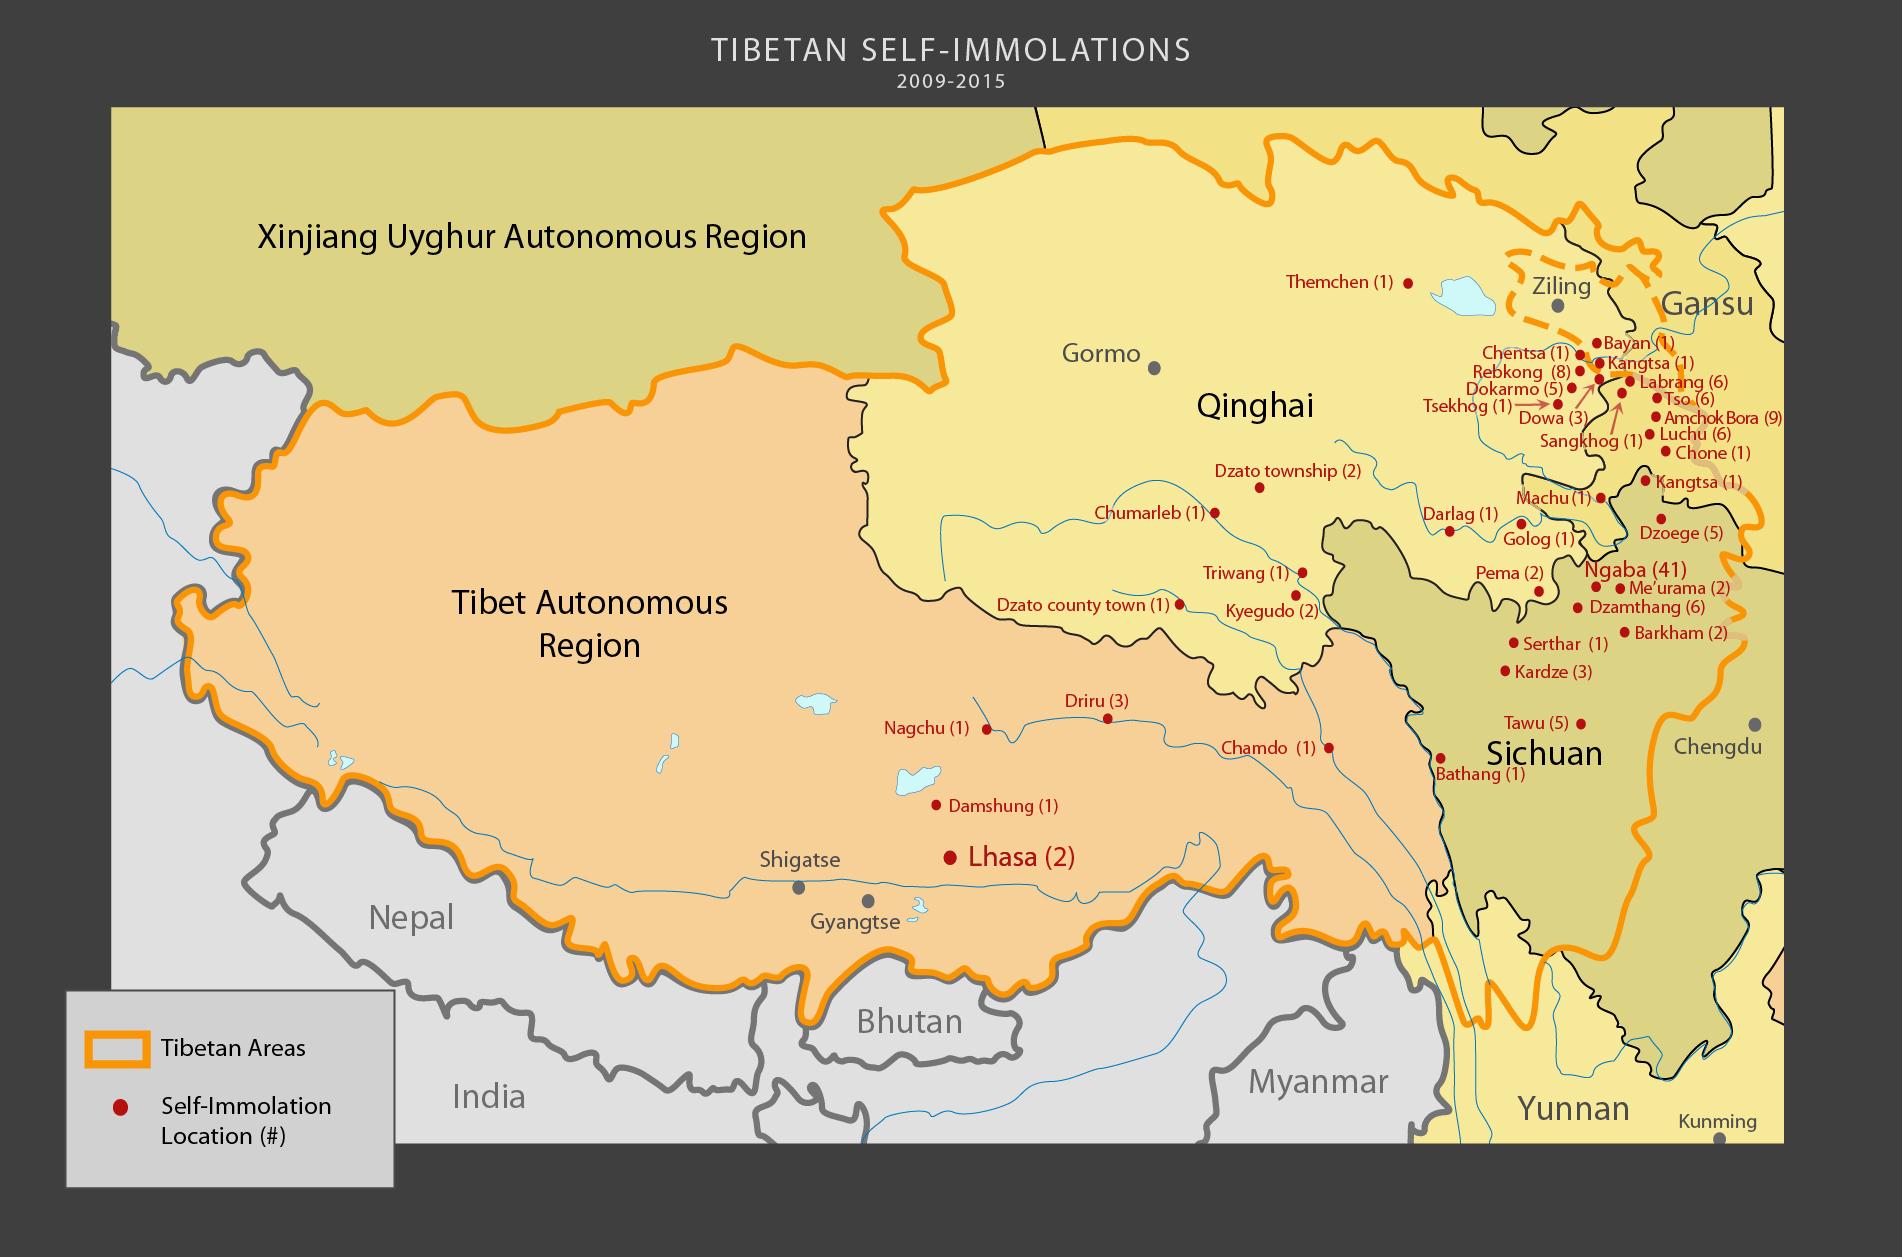 Tibetan self-immolations from 2009-2015